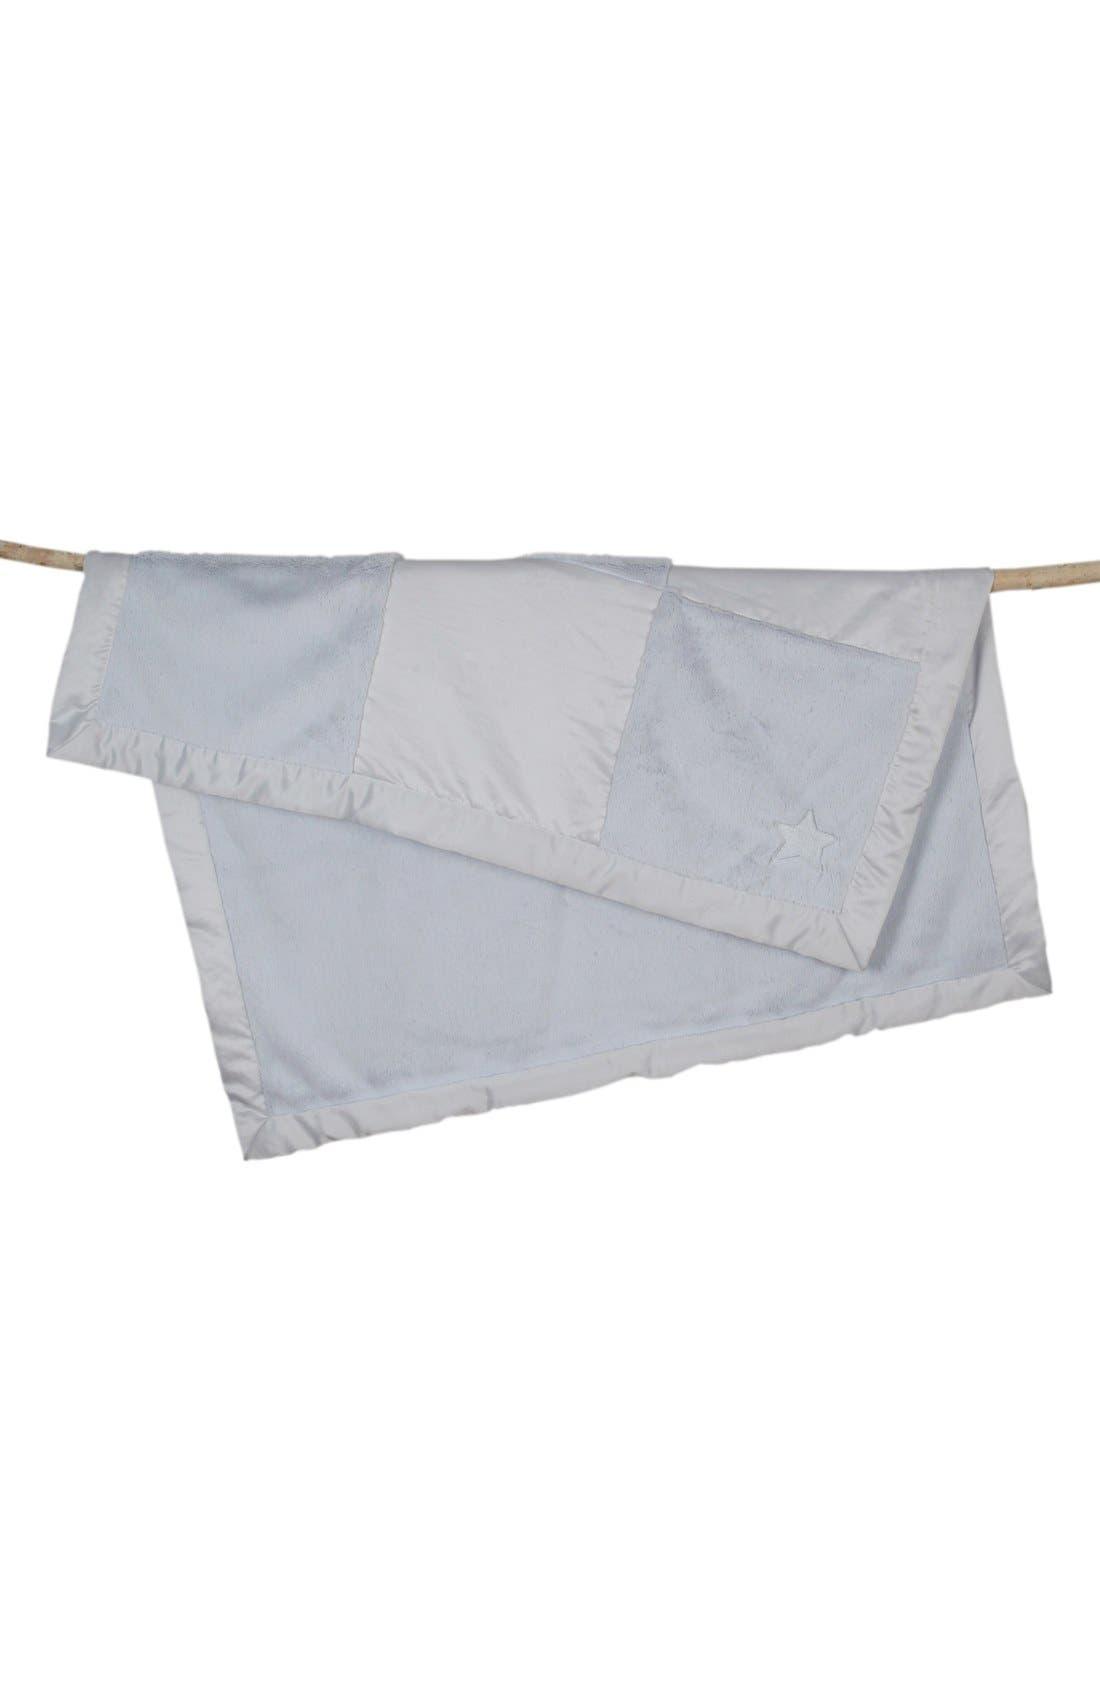 BAREFOOT DREAMS® 'Cuddle' Patchwork Receiving Blanket